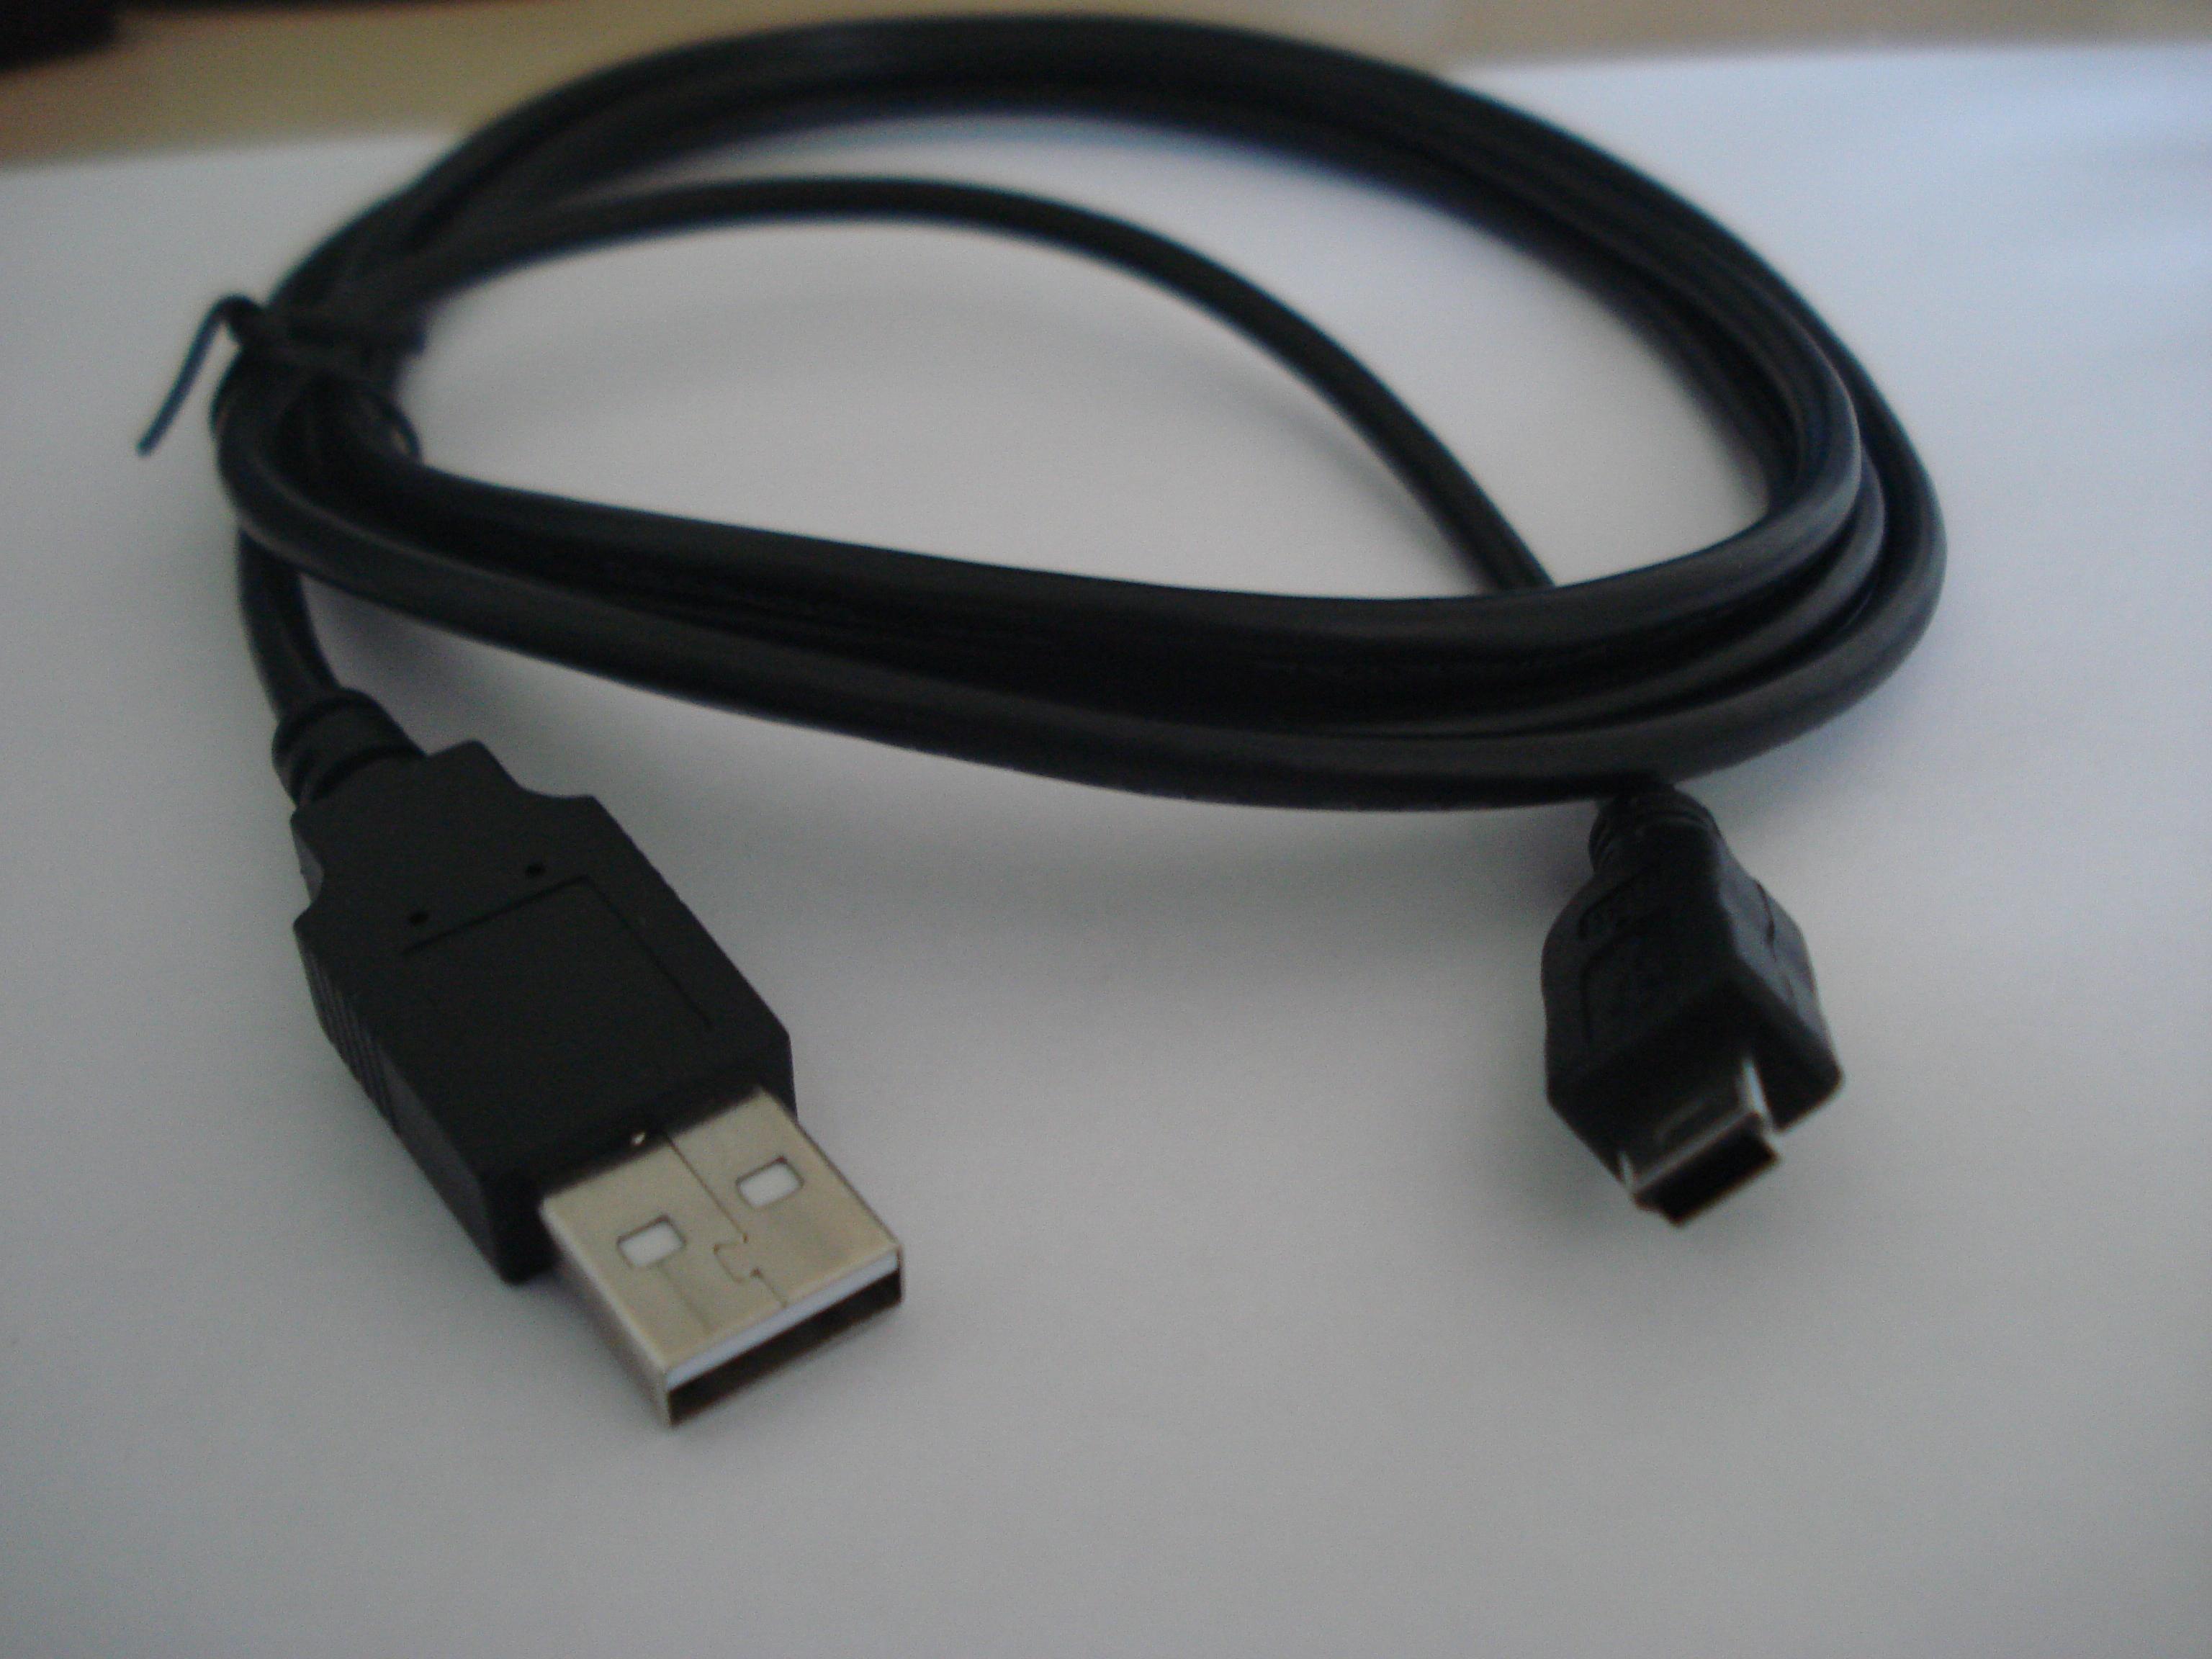 Cabo USB Câmera A Macho x Mini-M 5 Pinos 1.50m Preto